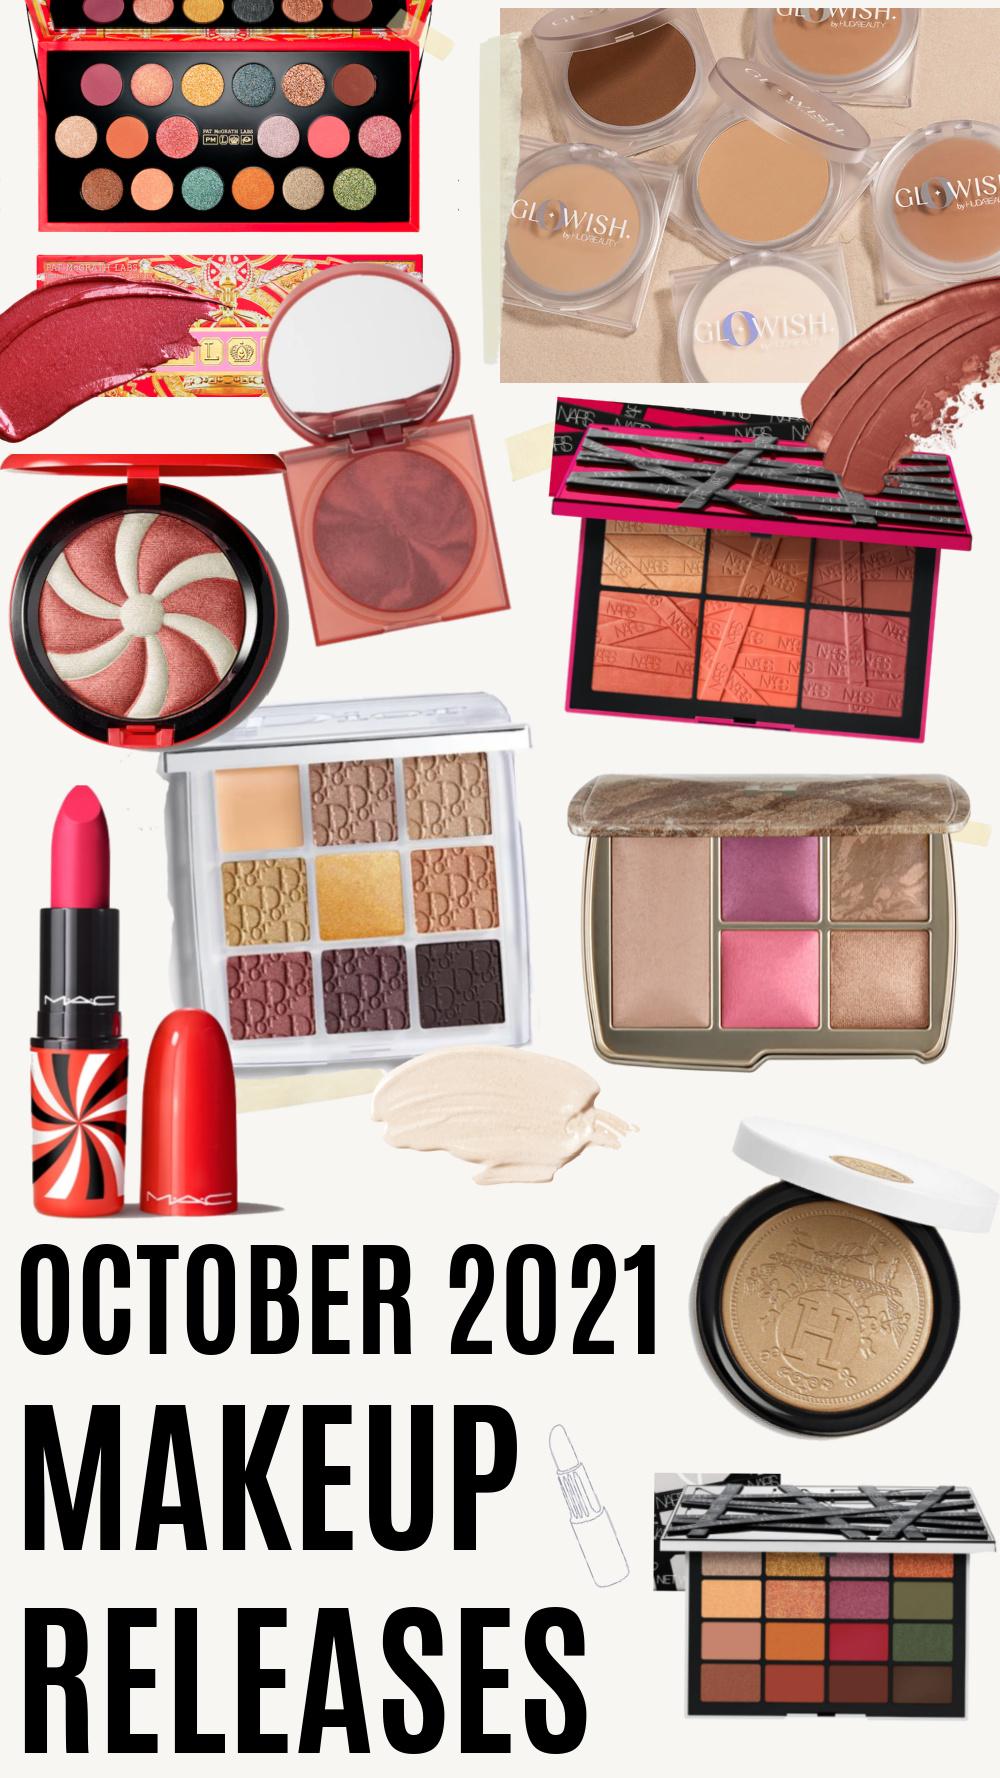 October 2021 Makeup Releases I Dreamnlace.com #makeupaddict #beautyblog